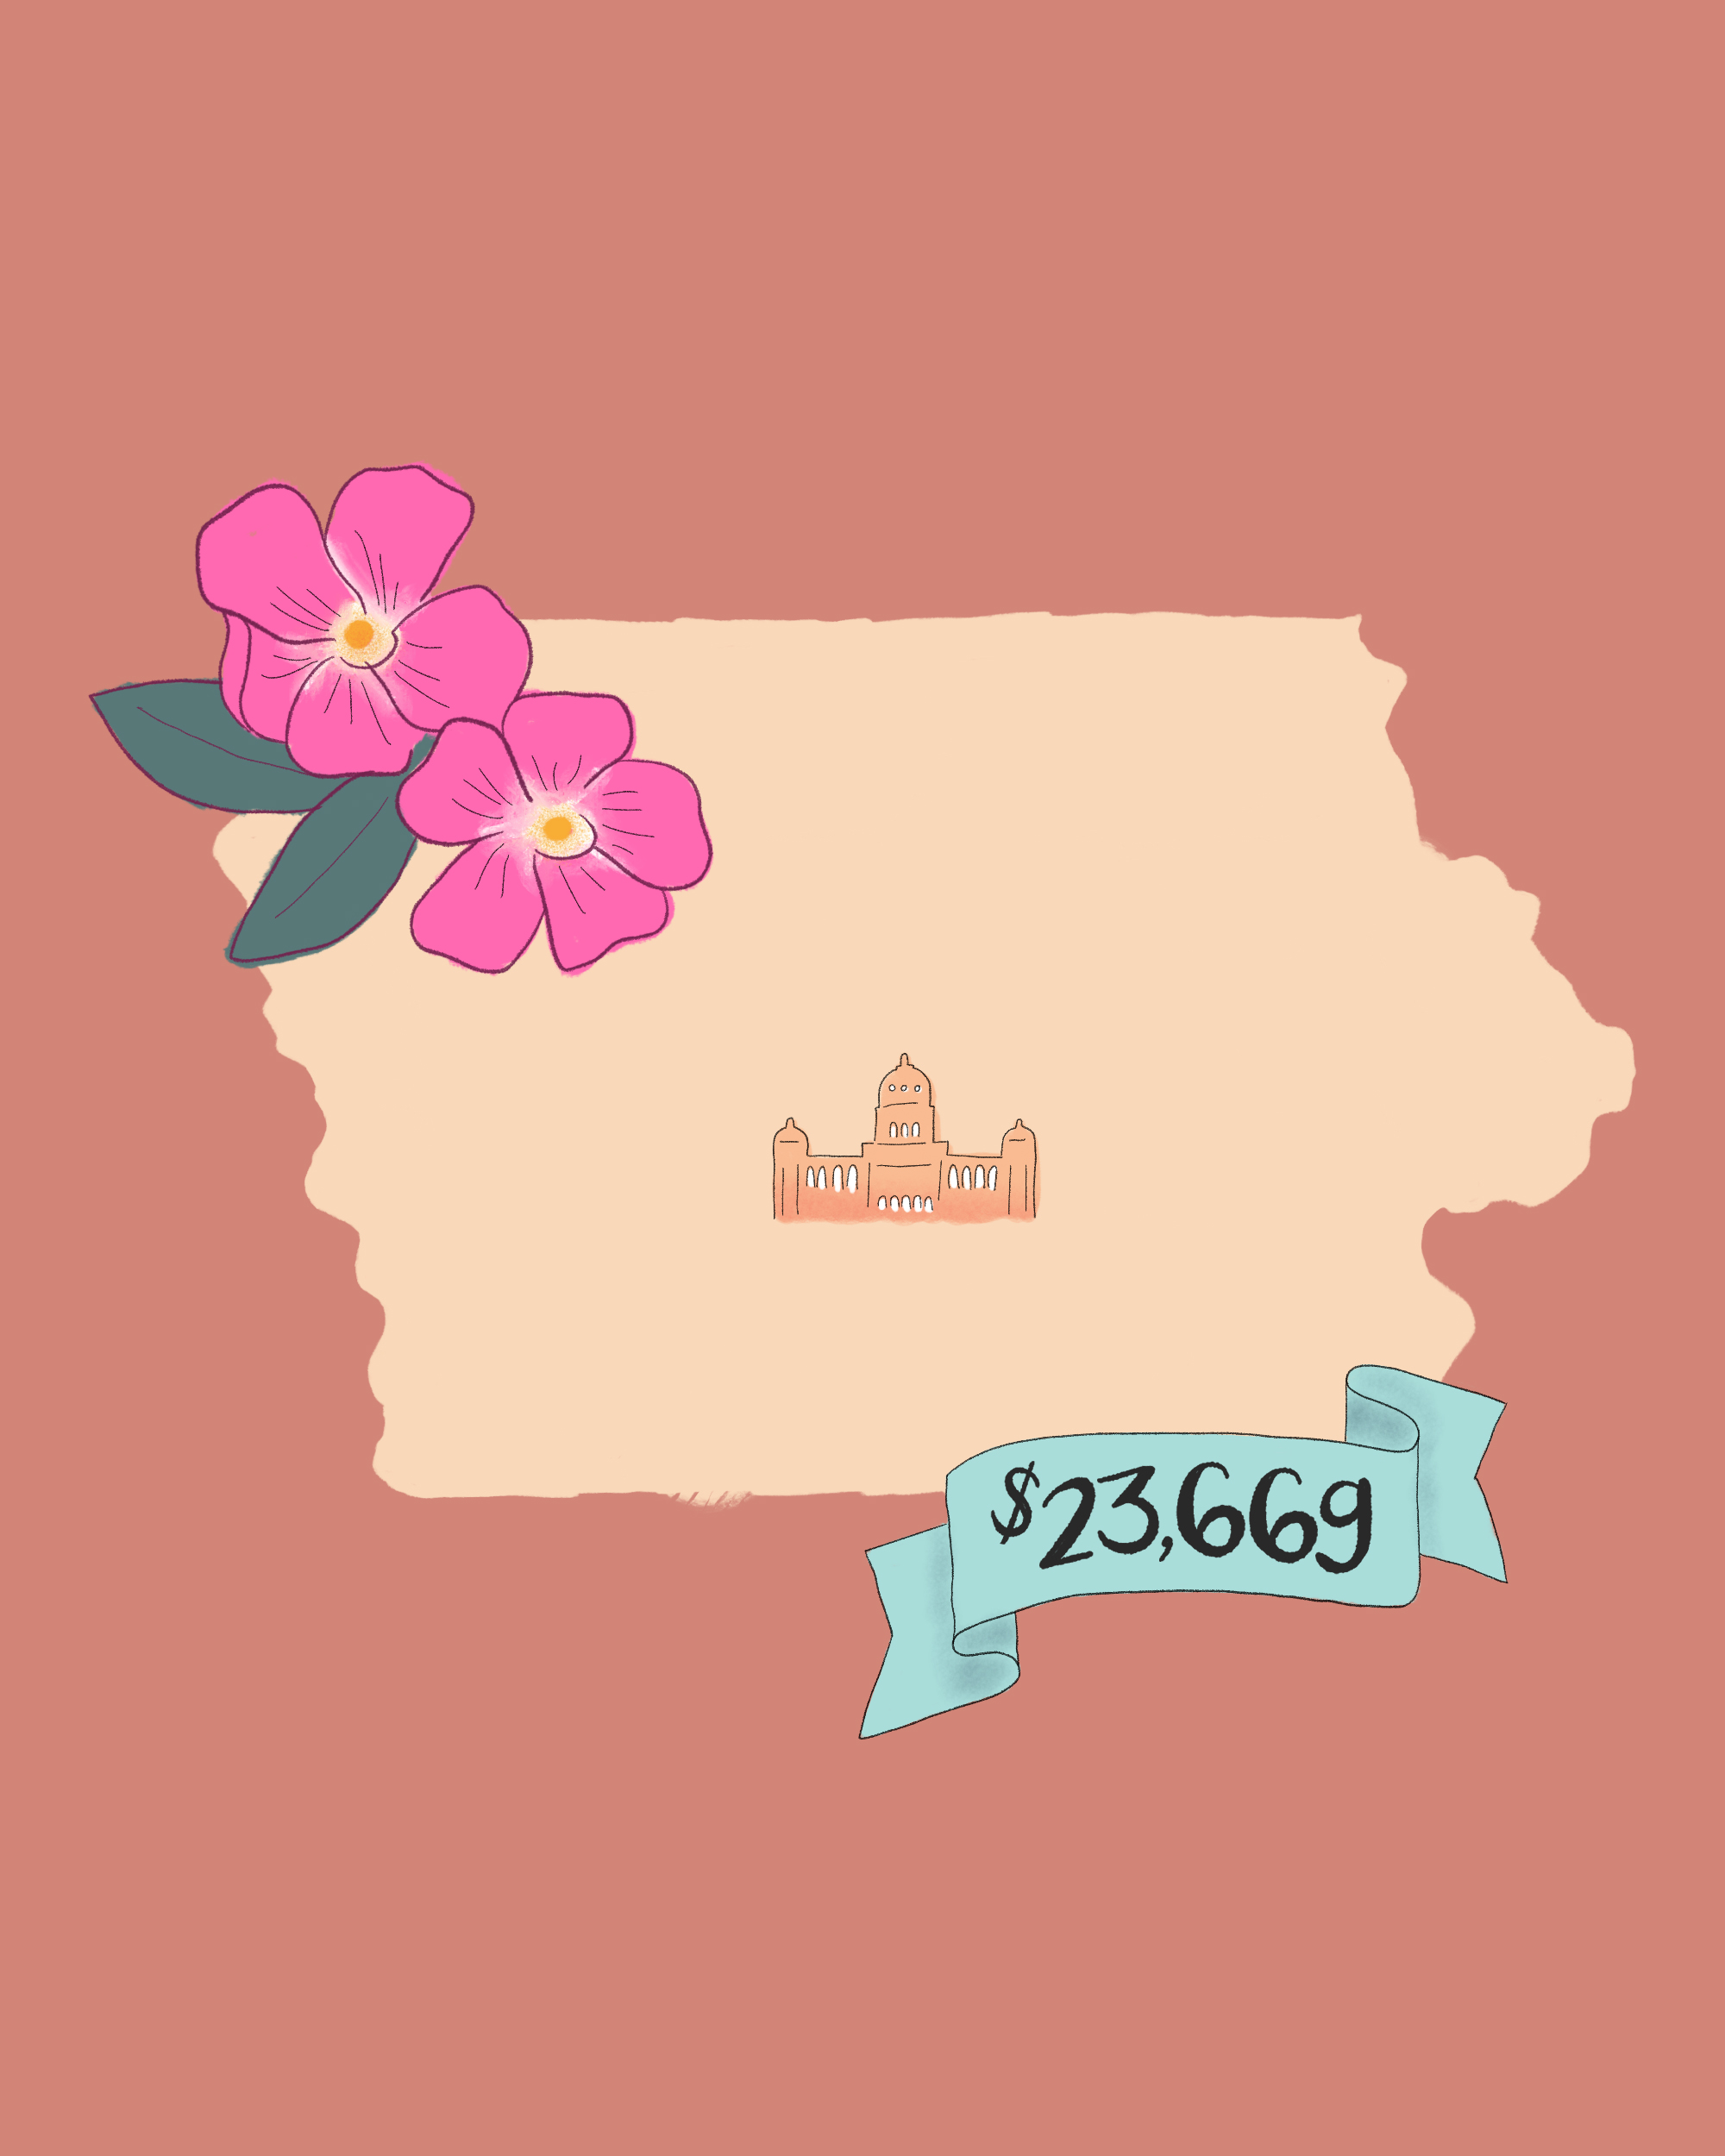 state wedding costs illustration iowa